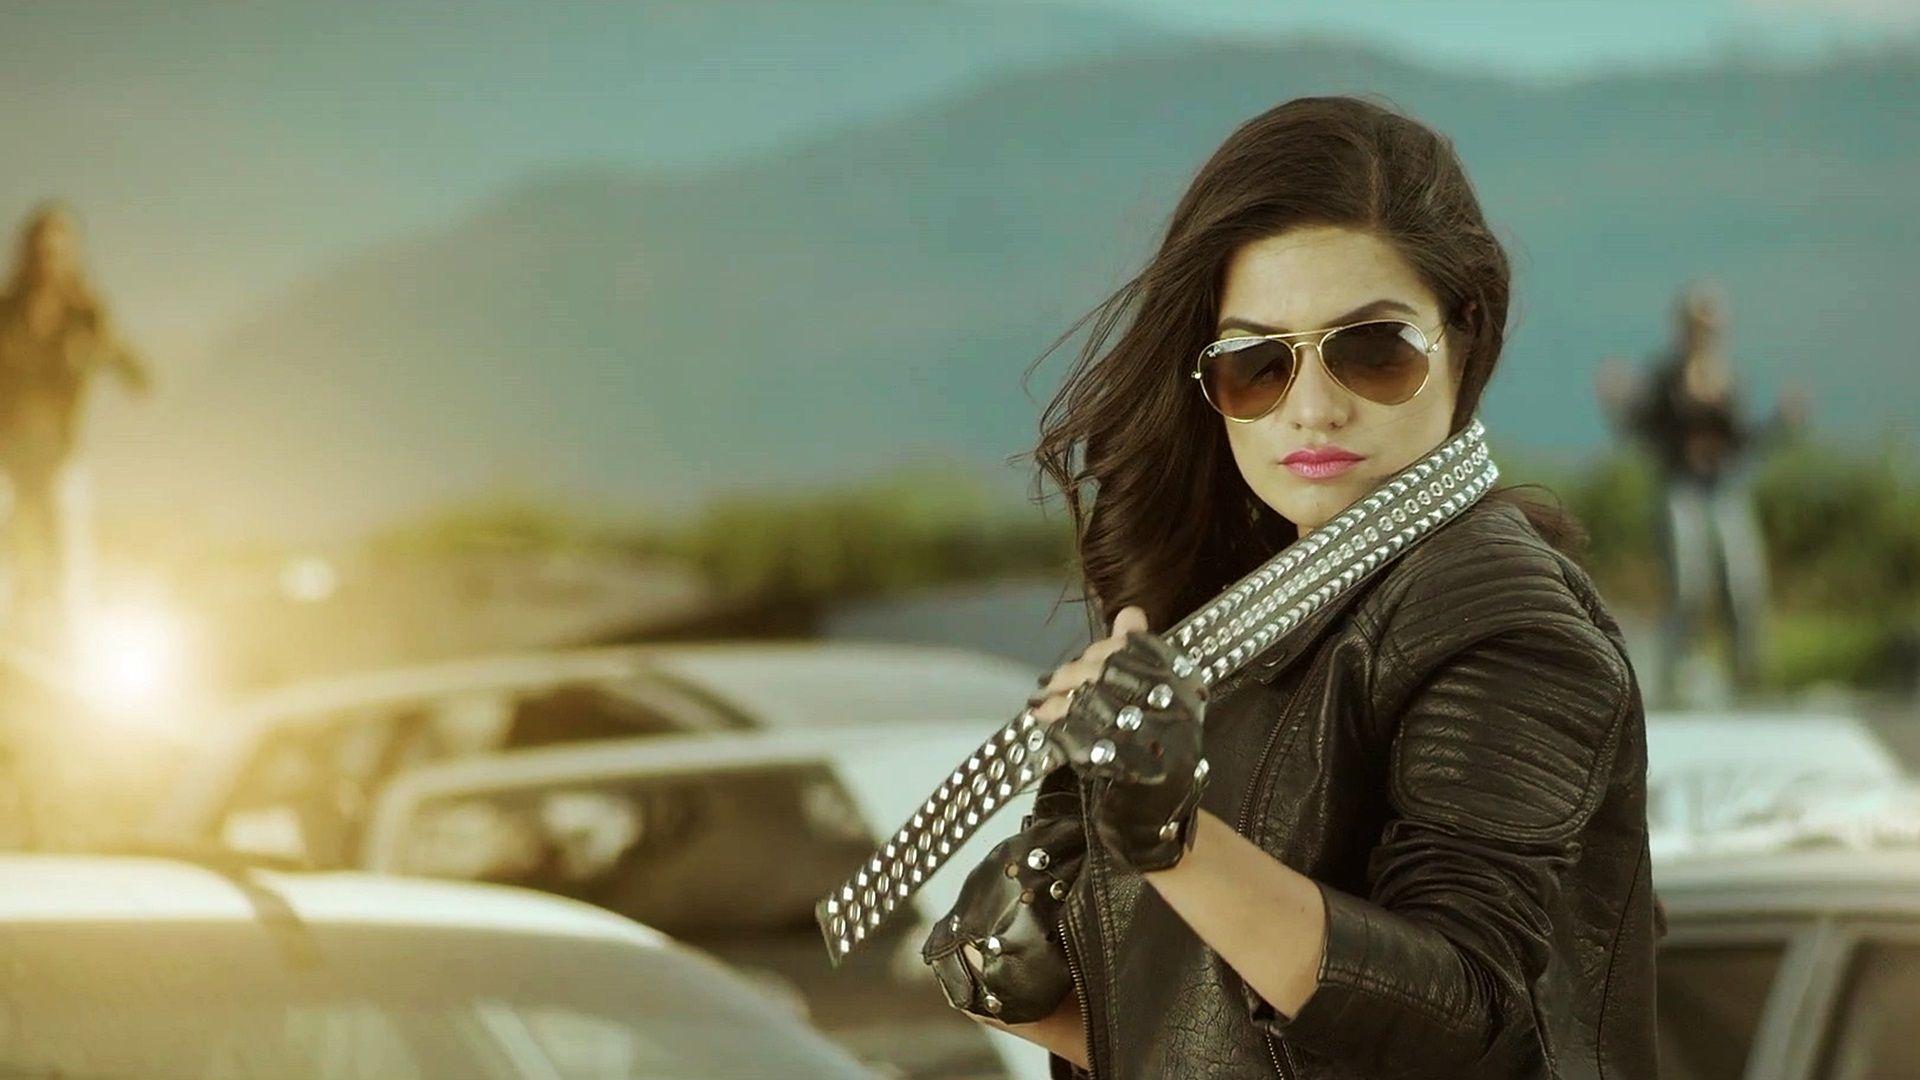 Cute b wallpapers top free cute b backgrounds - Kaur b pics hd ...